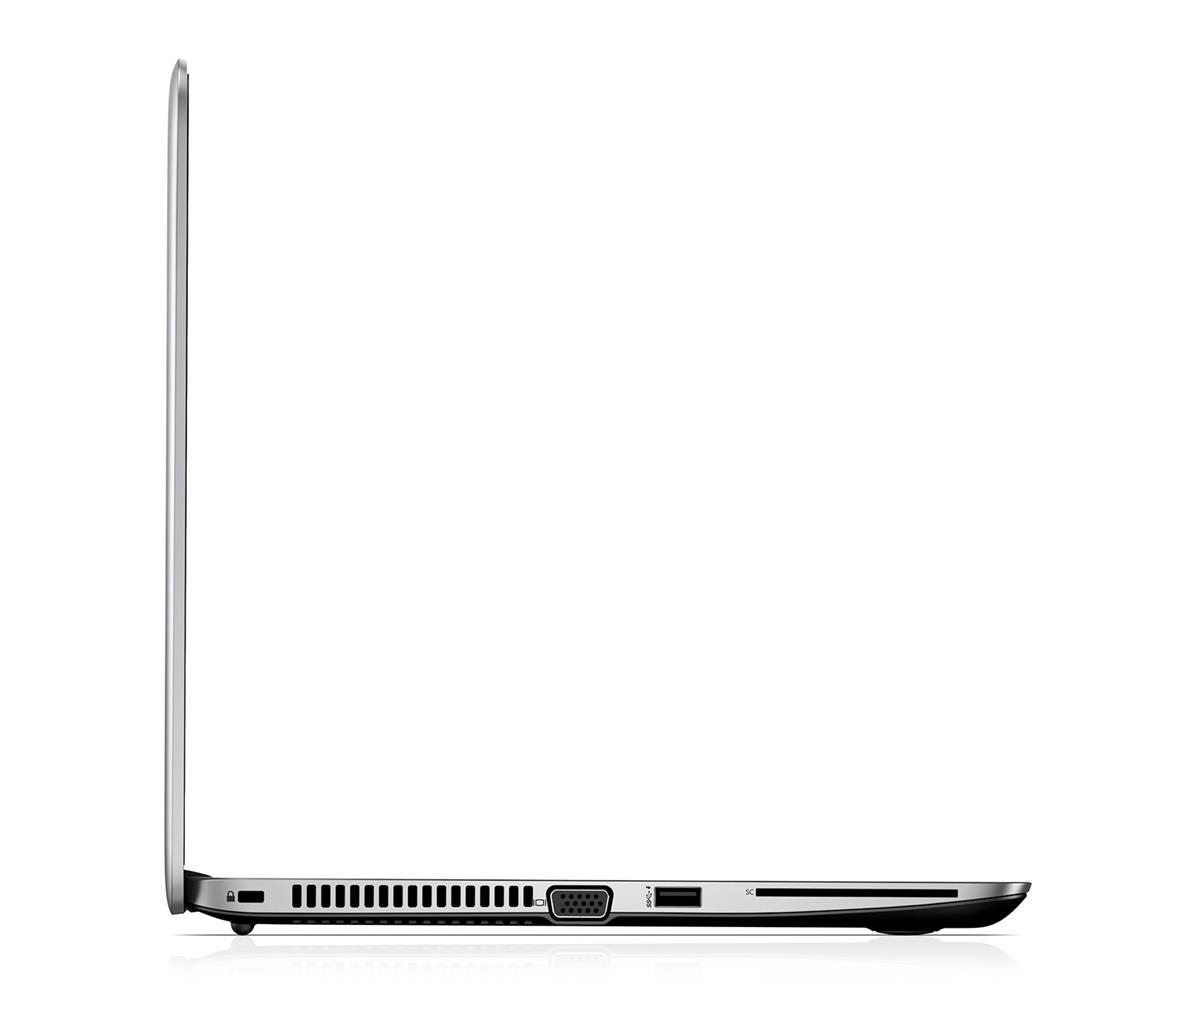 HP EliteBook 745 G3 (14 inch) Notebook PC Pro A12 (8800B